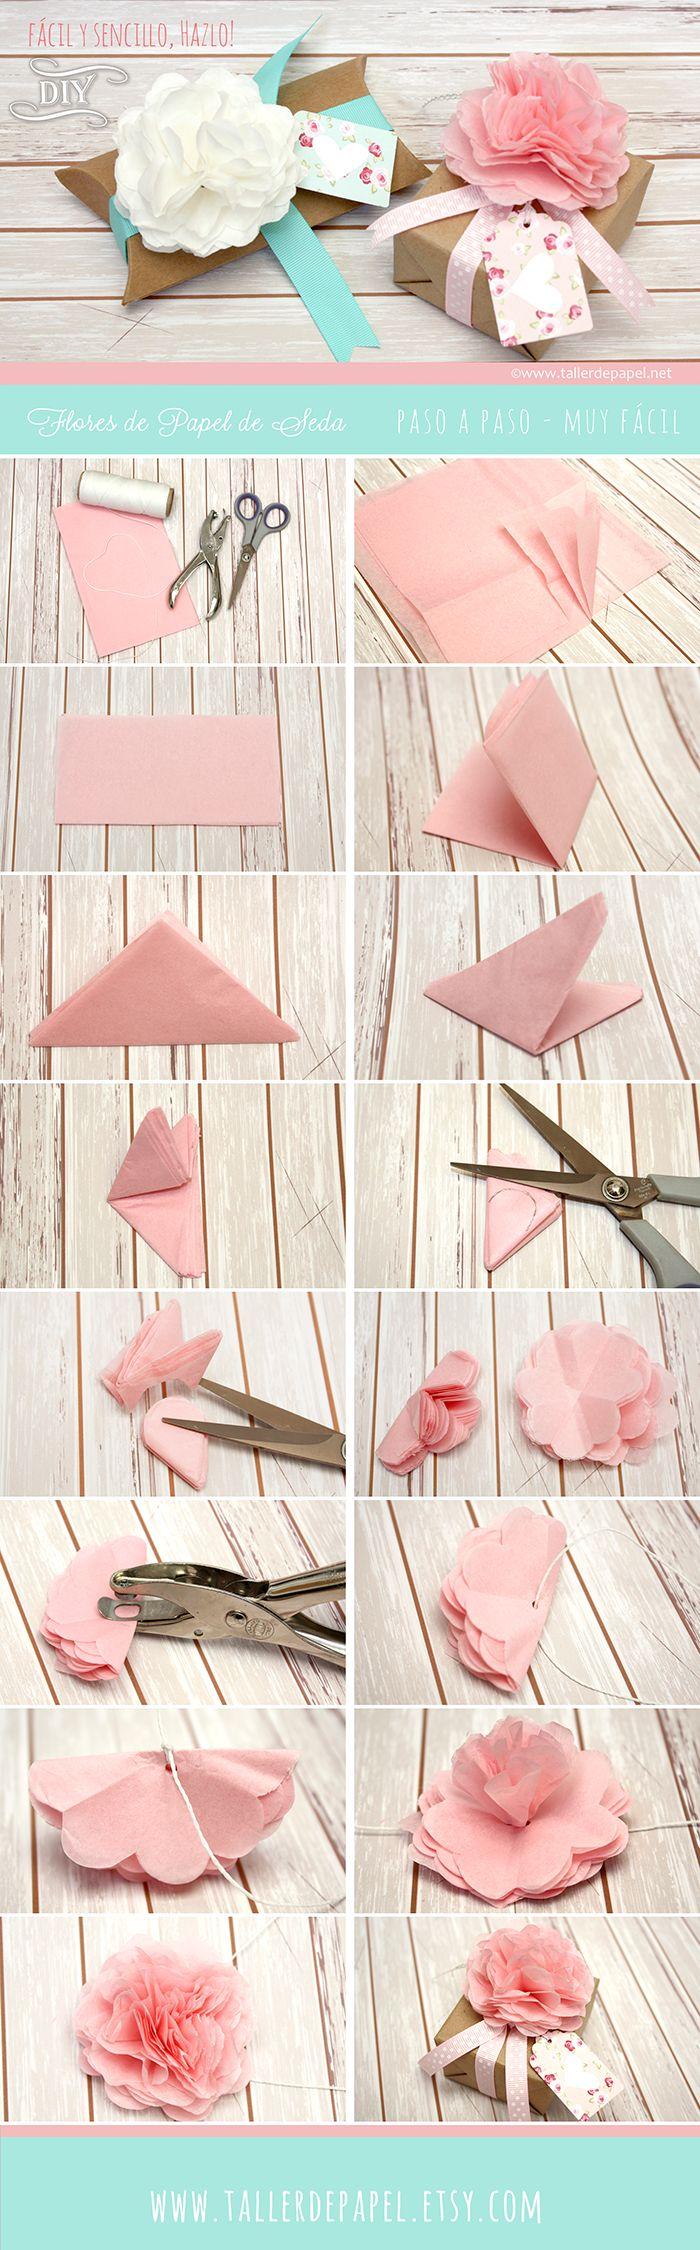 Moño floral de papel